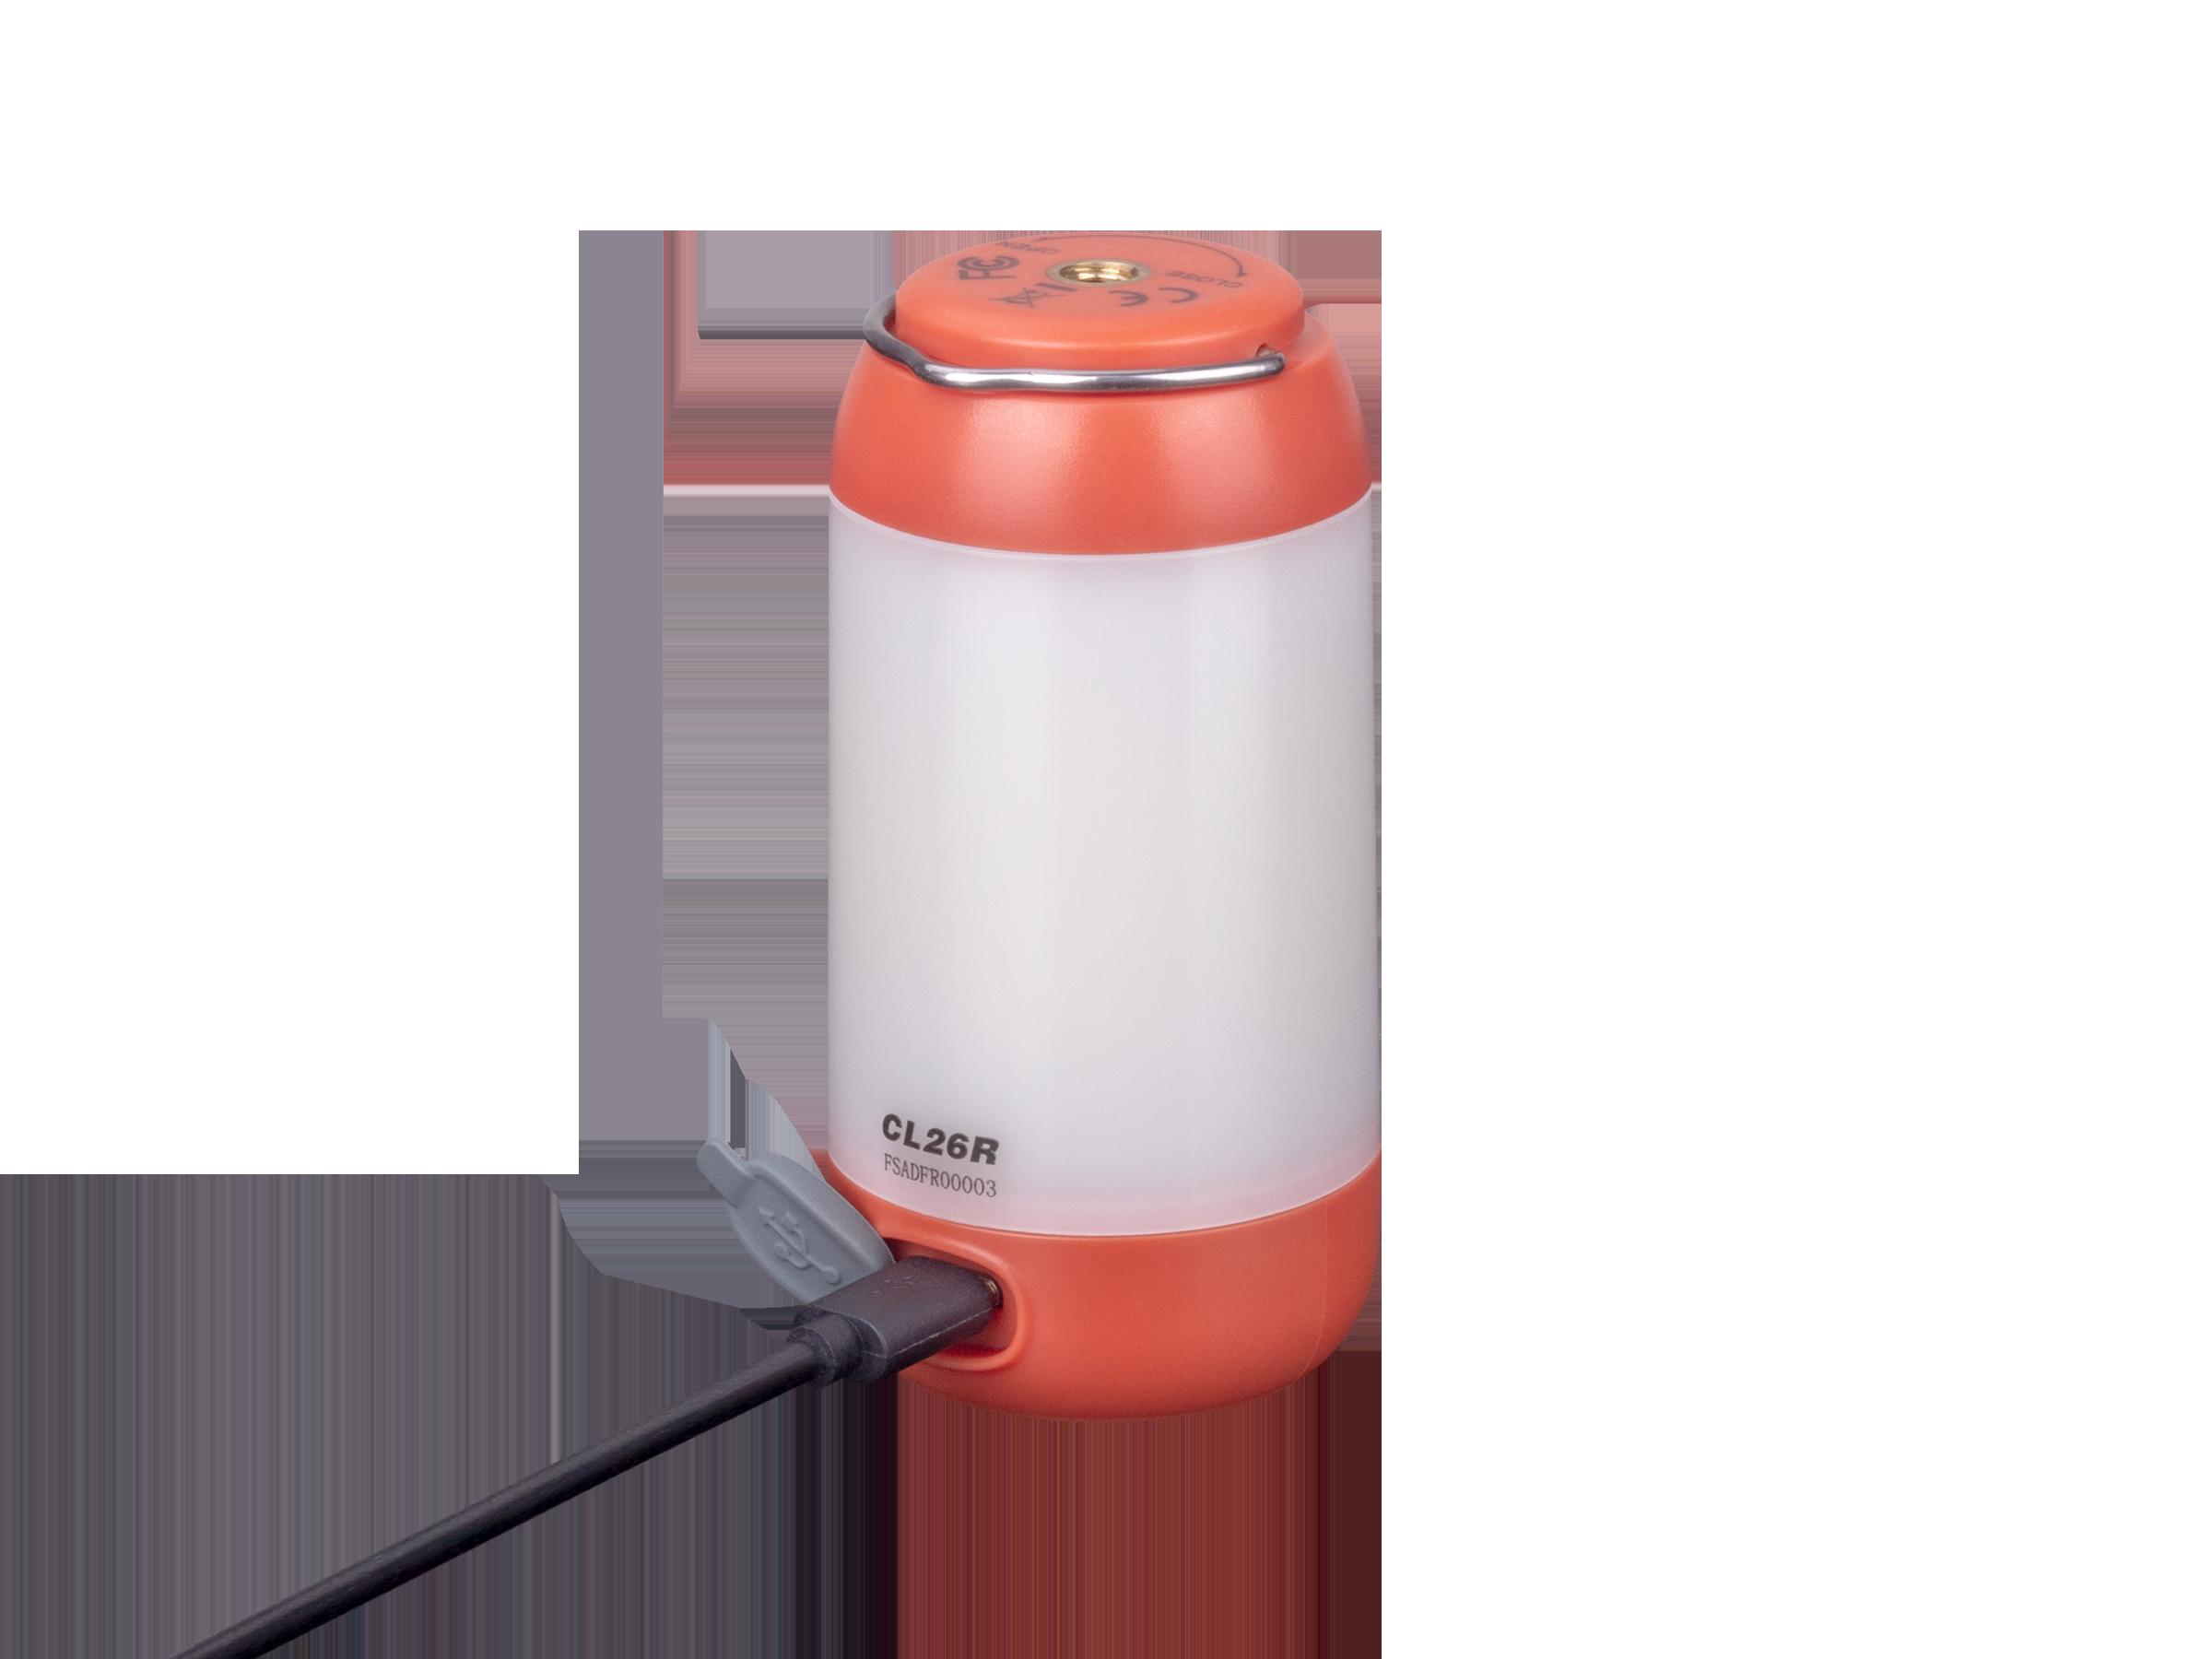 Fenix CL26R Rechargeable Lantern